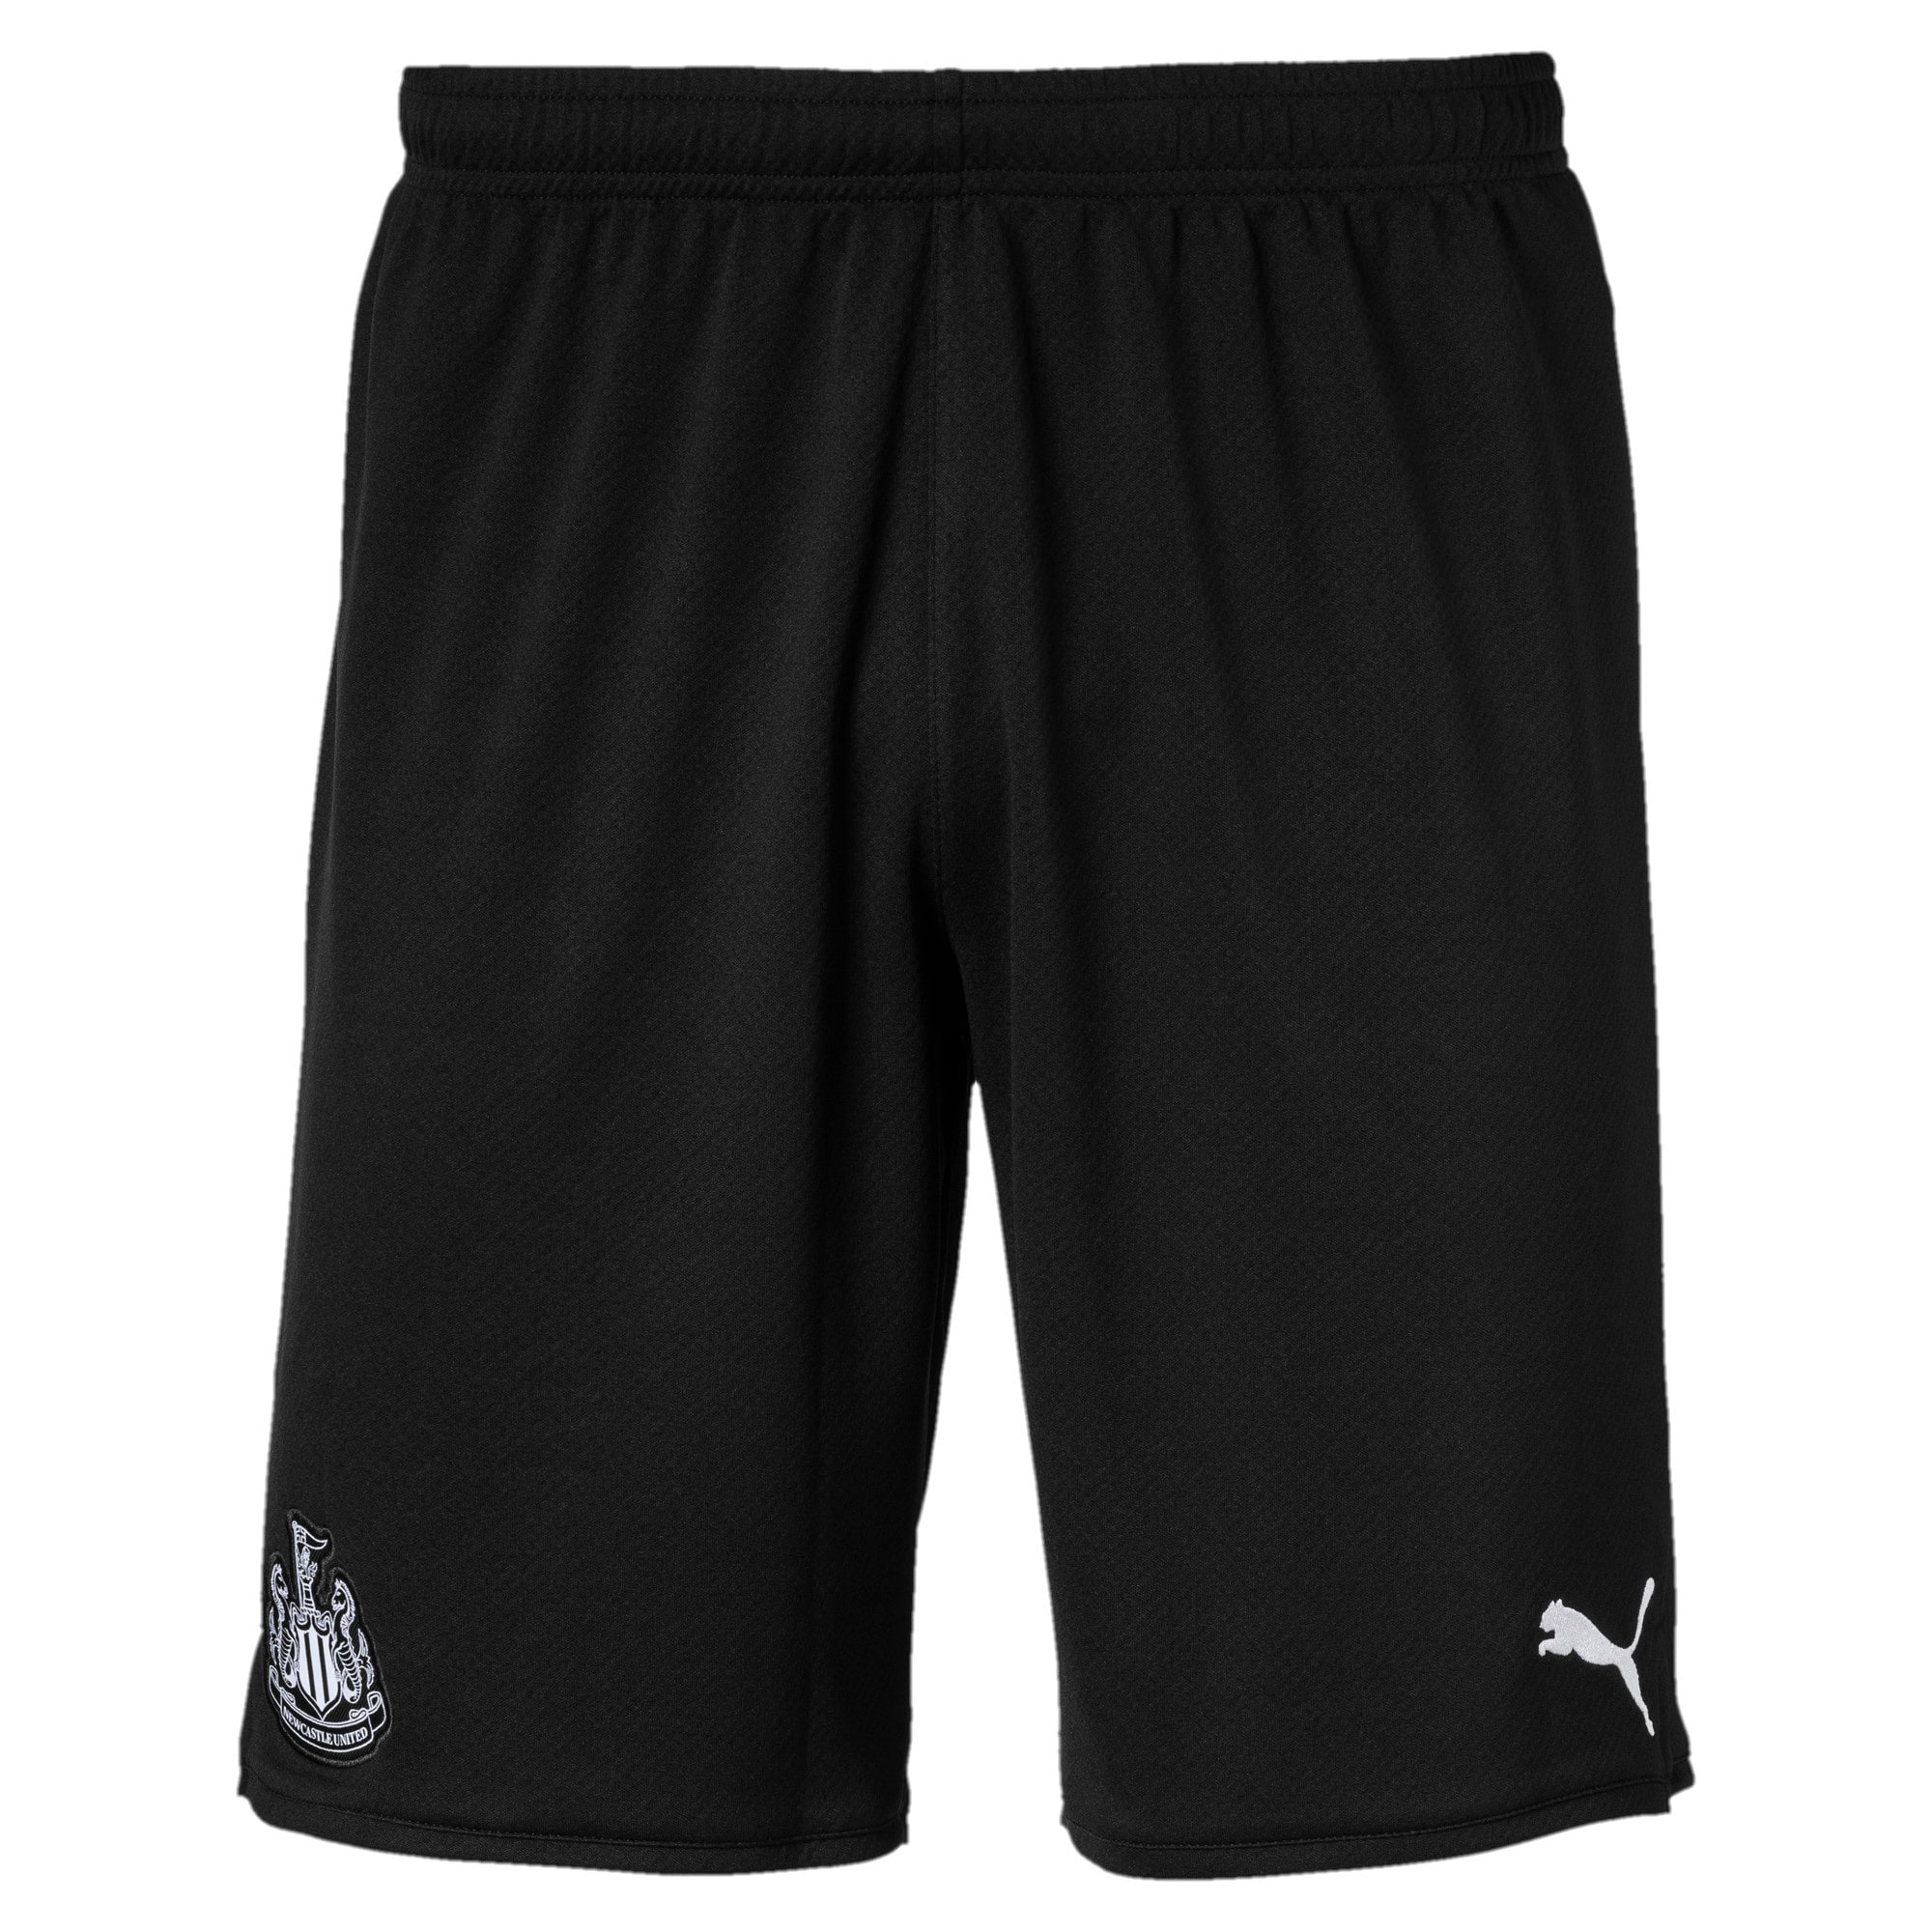 Thumbnail 1 of Newcastle United FC Men's Replica Shorts, Puma Black, medium